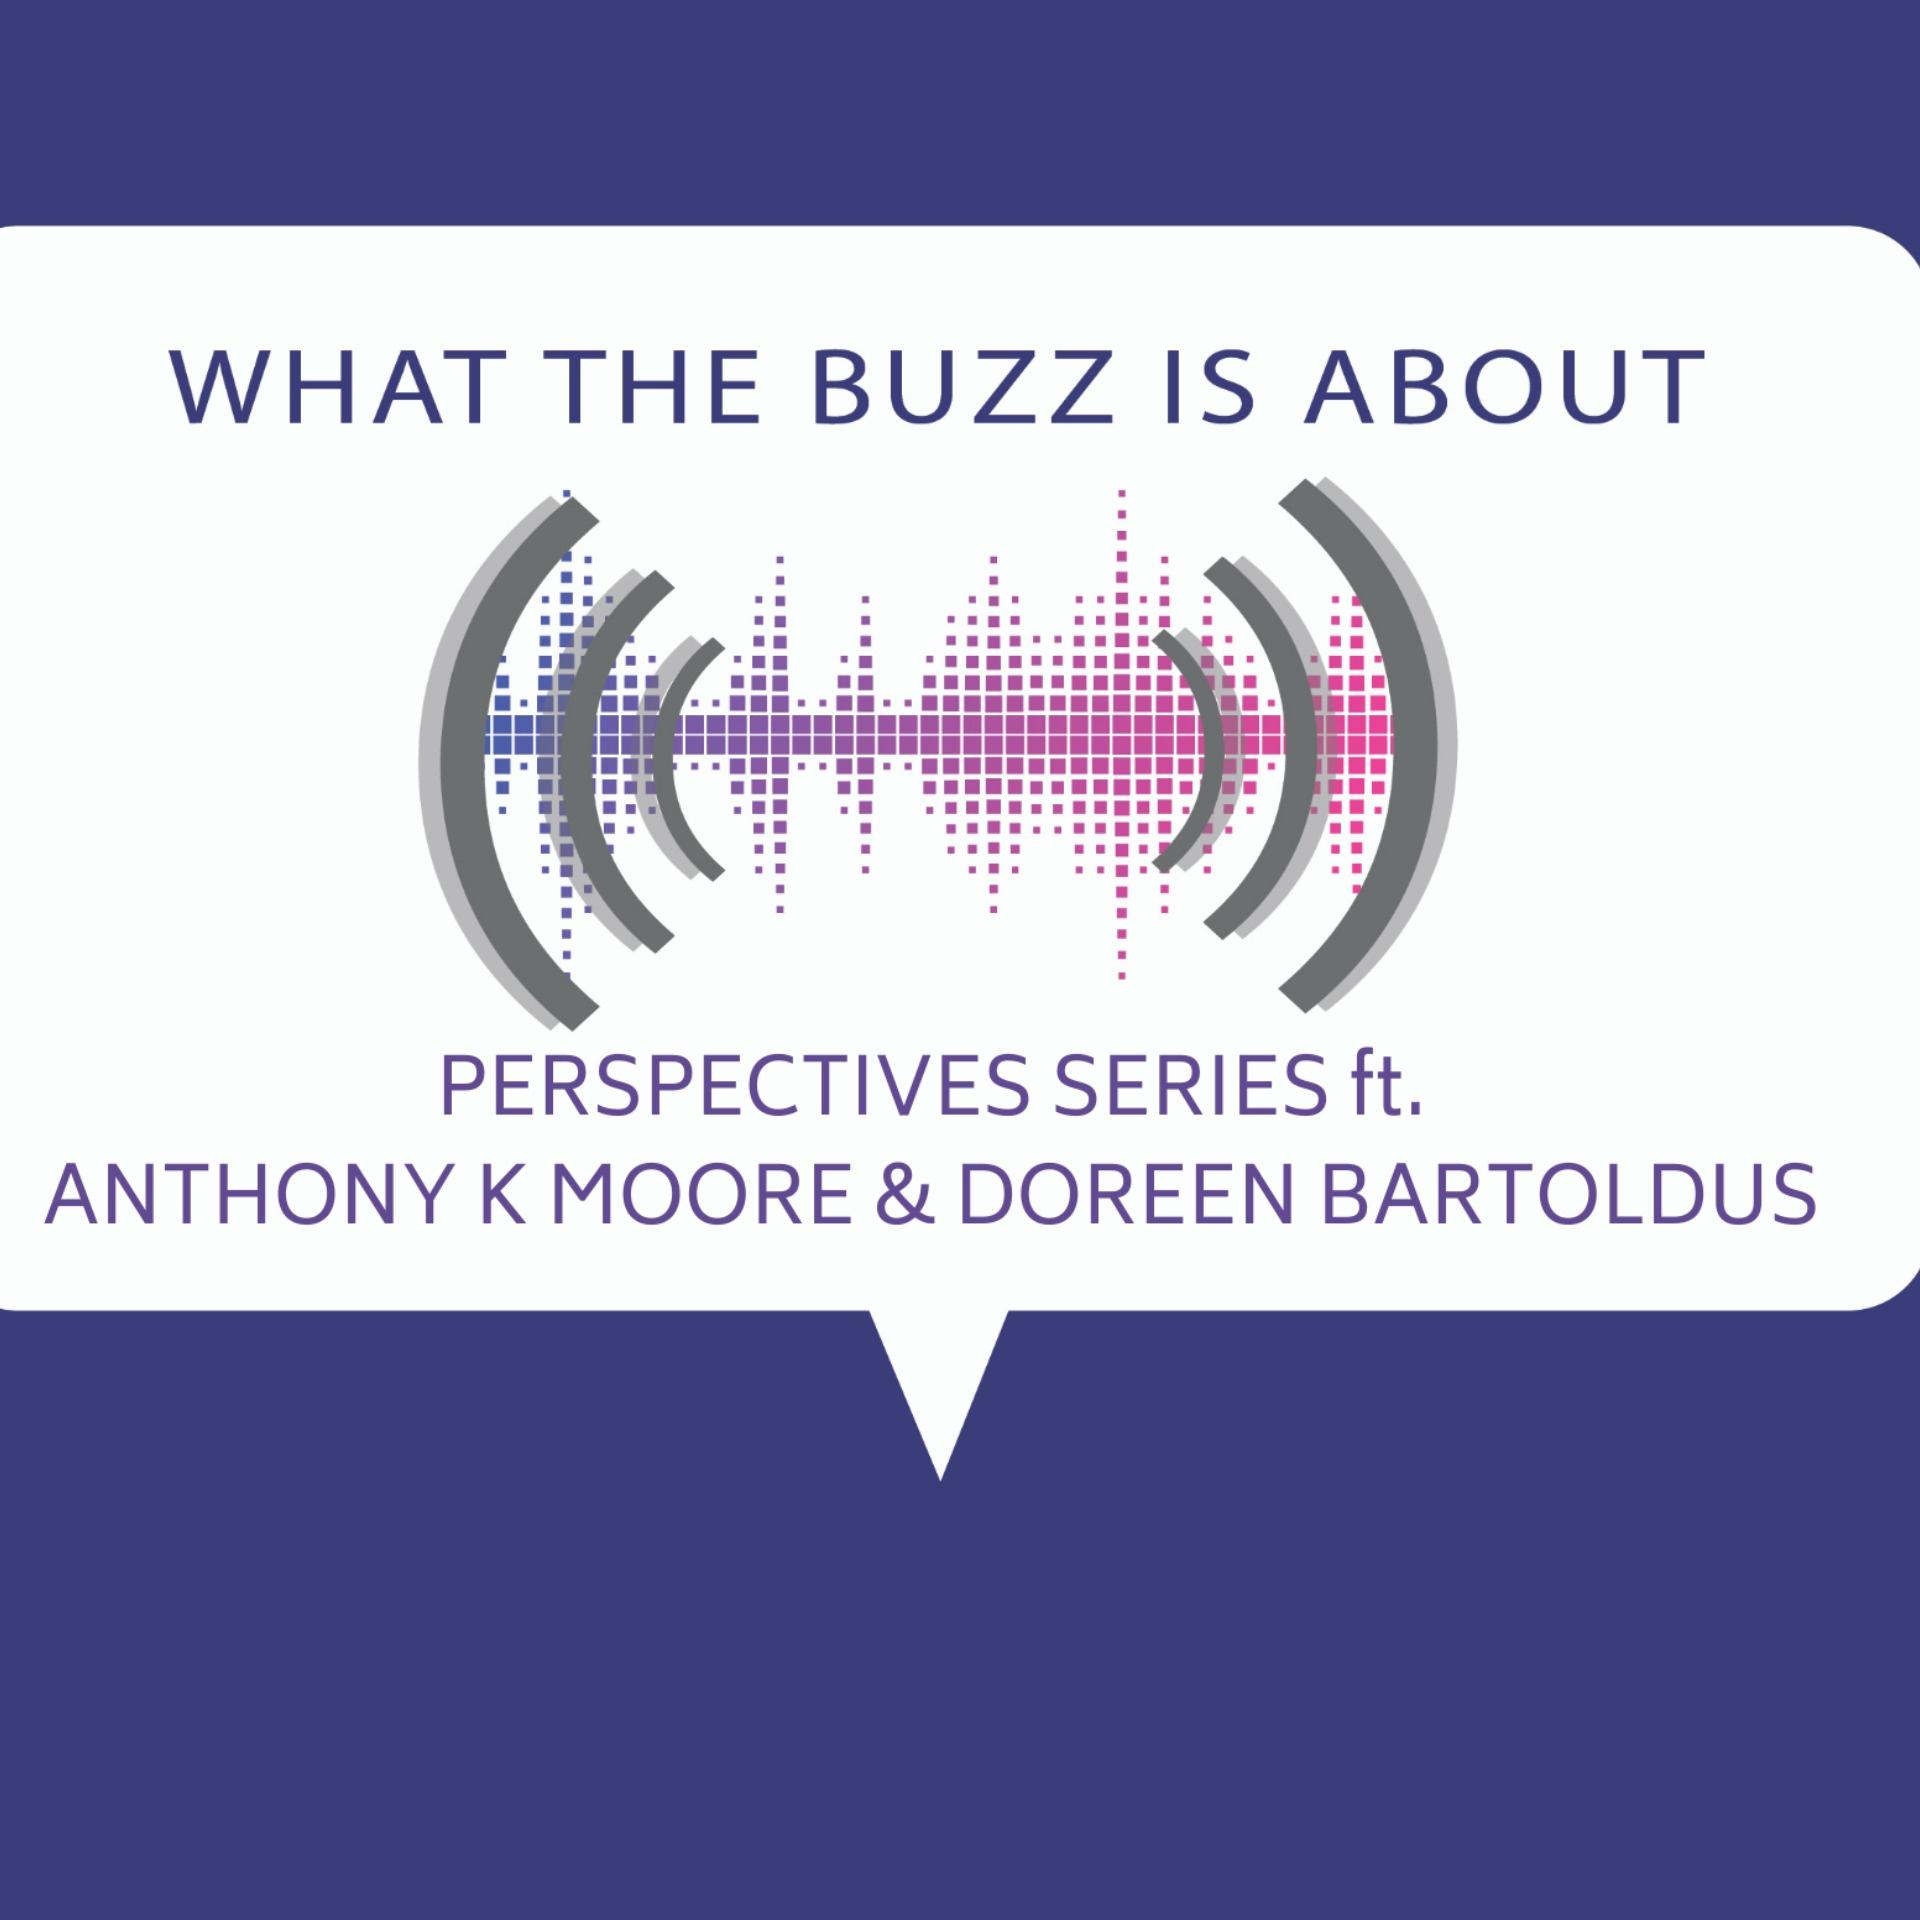 Perspectives Series ft. Anthony K Moore & Doreen Bartoldus